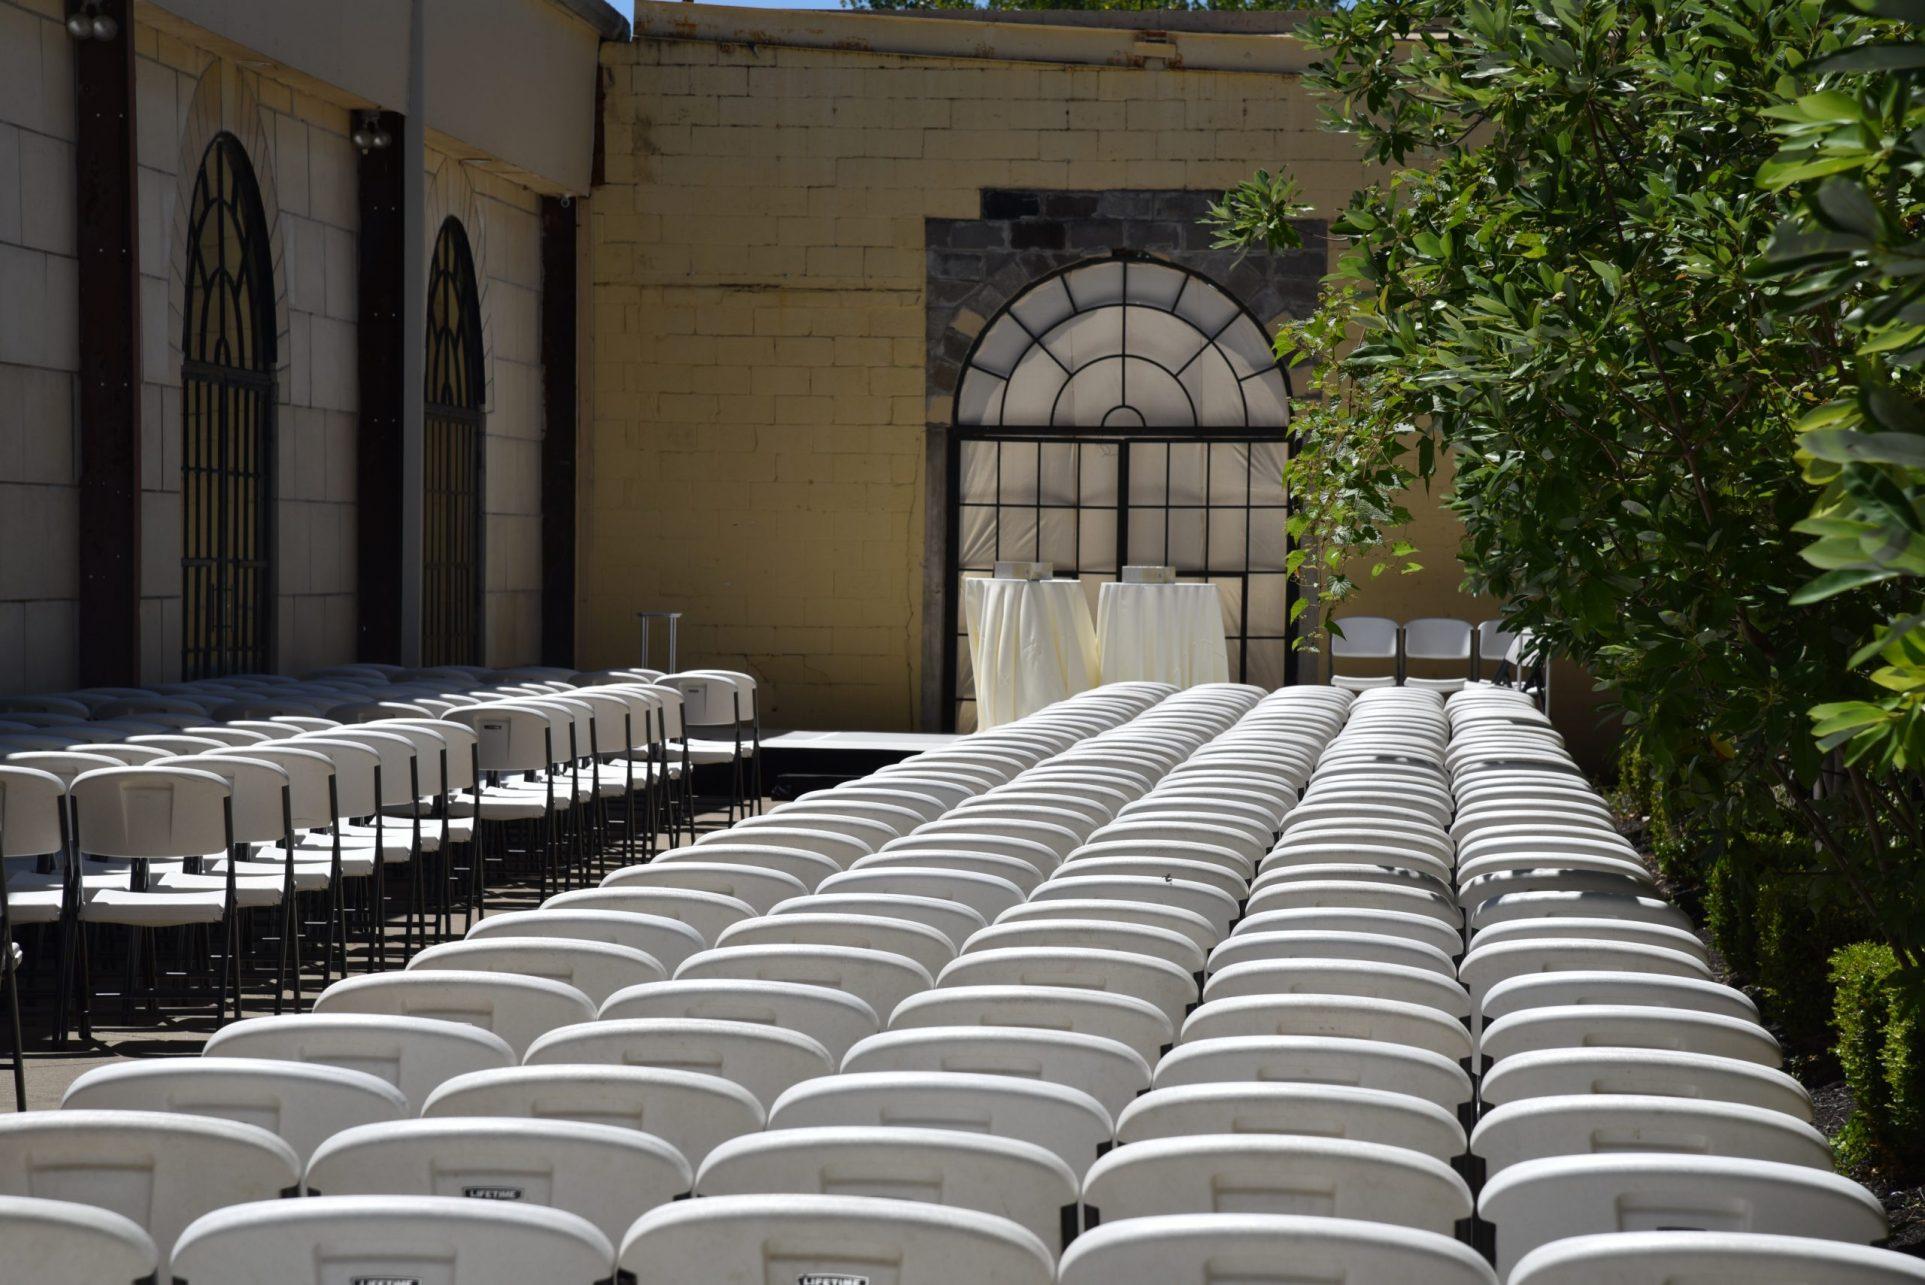 Van Gogh: Courtyard Setup for Ceremony